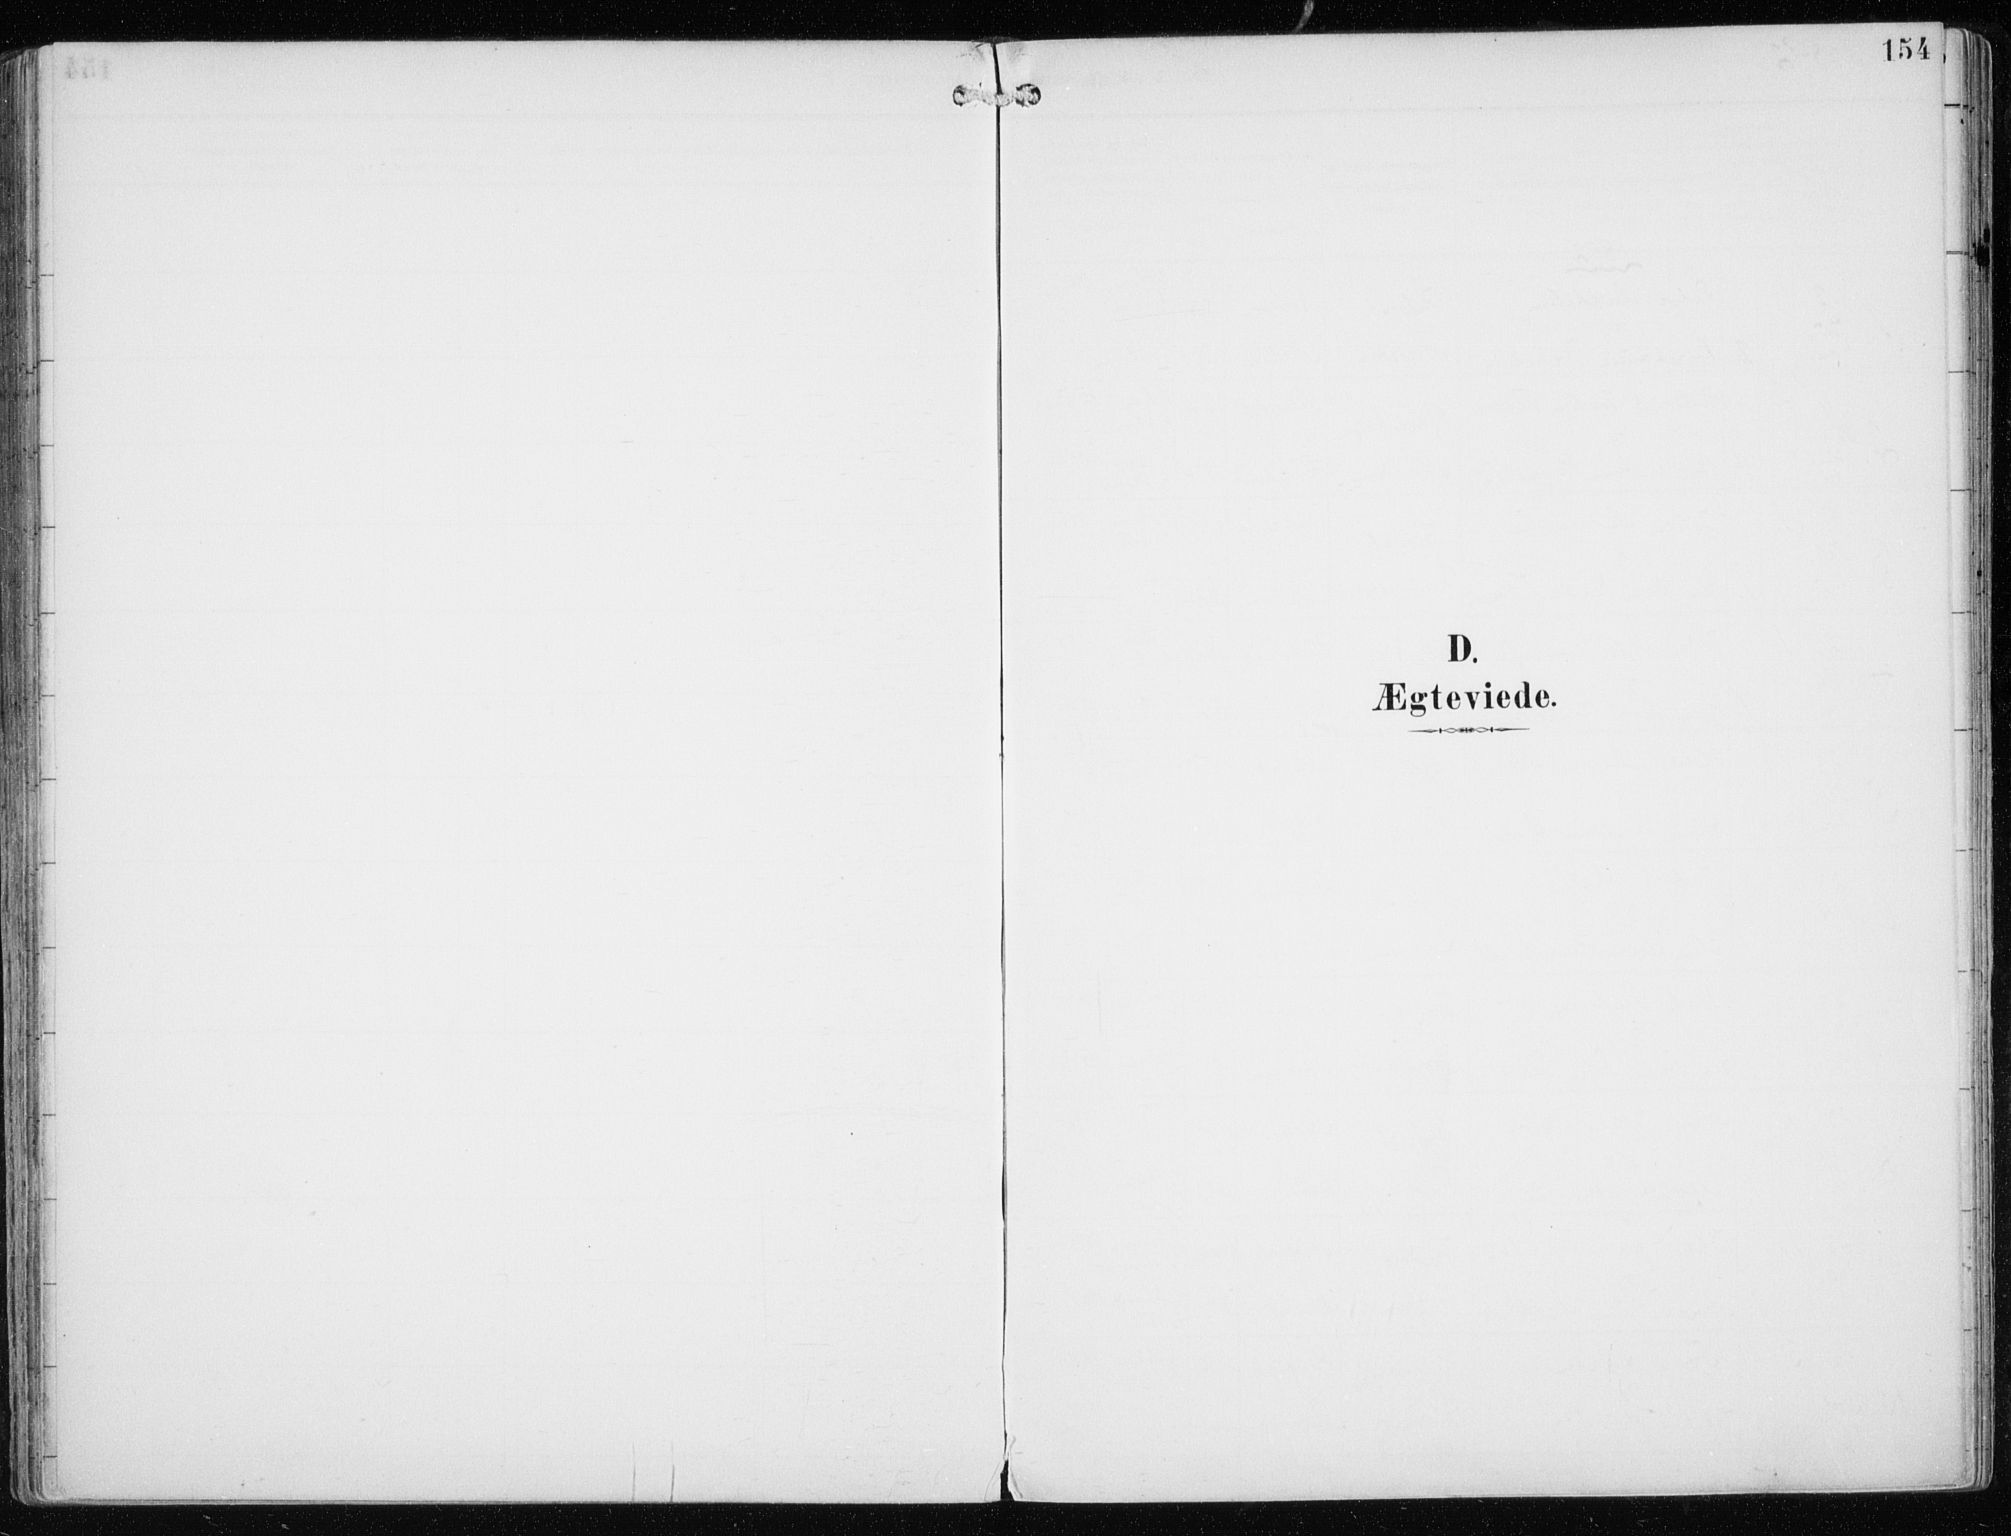 SATØ, Skjervøy sokneprestkontor, H/Ha/Haa/L0016kirke: Ministerialbok nr. 16, 1892-1908, s. 154